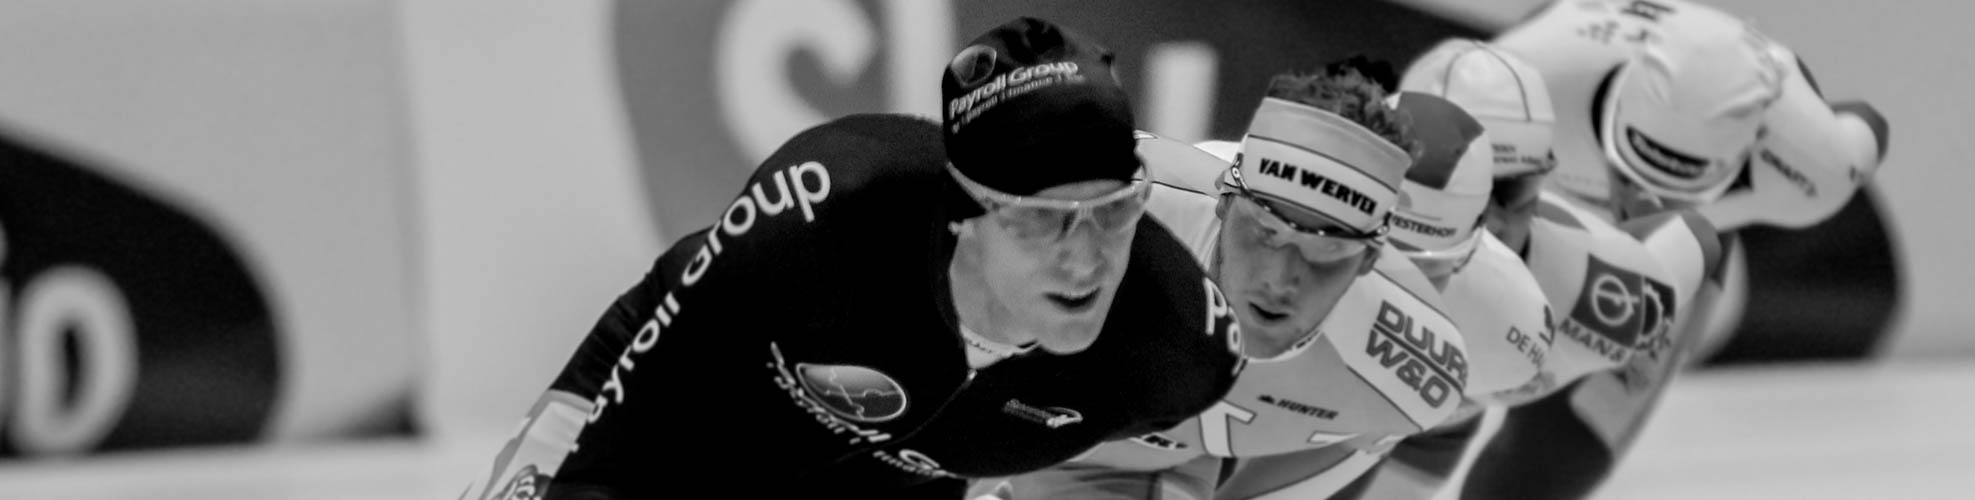 Oud-marathonschaatser Roger Schneider overleden